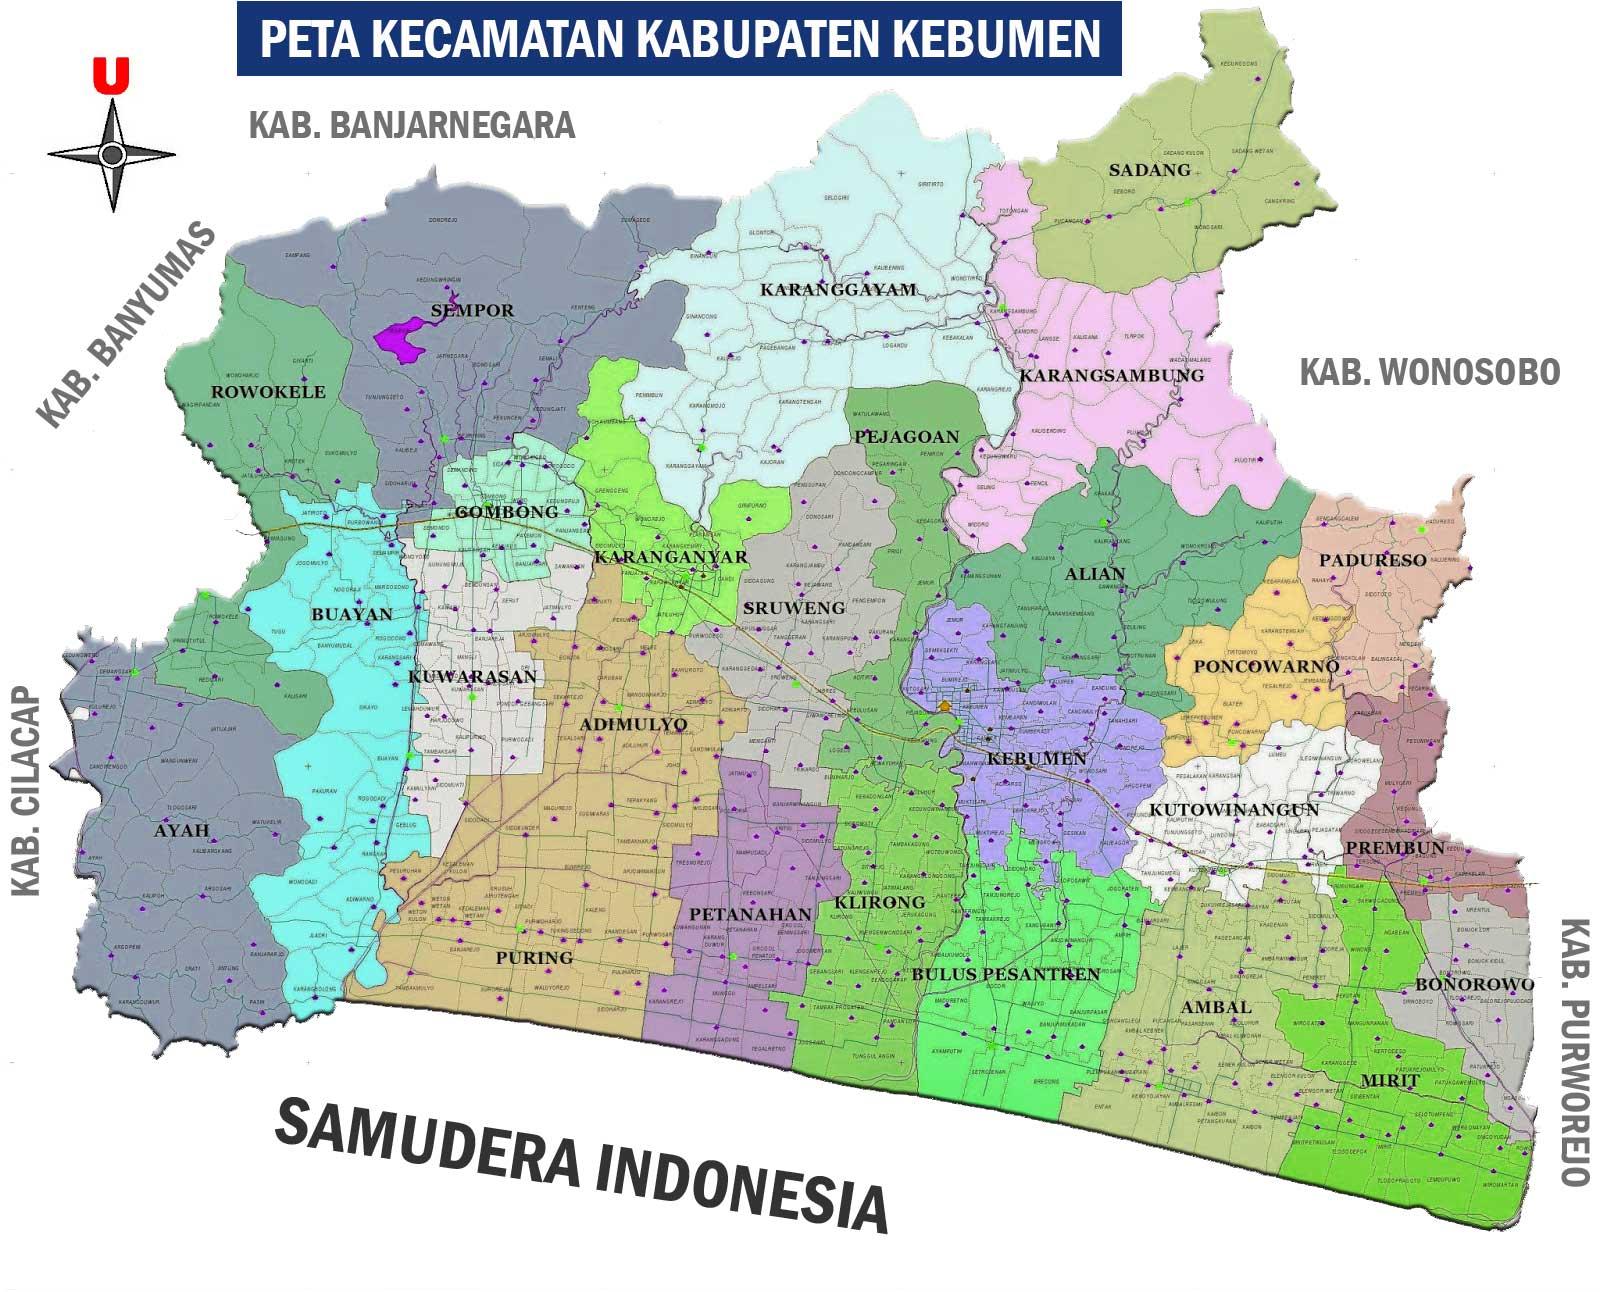 Gambar Peta Kecamatan Kabupaten Kebumen